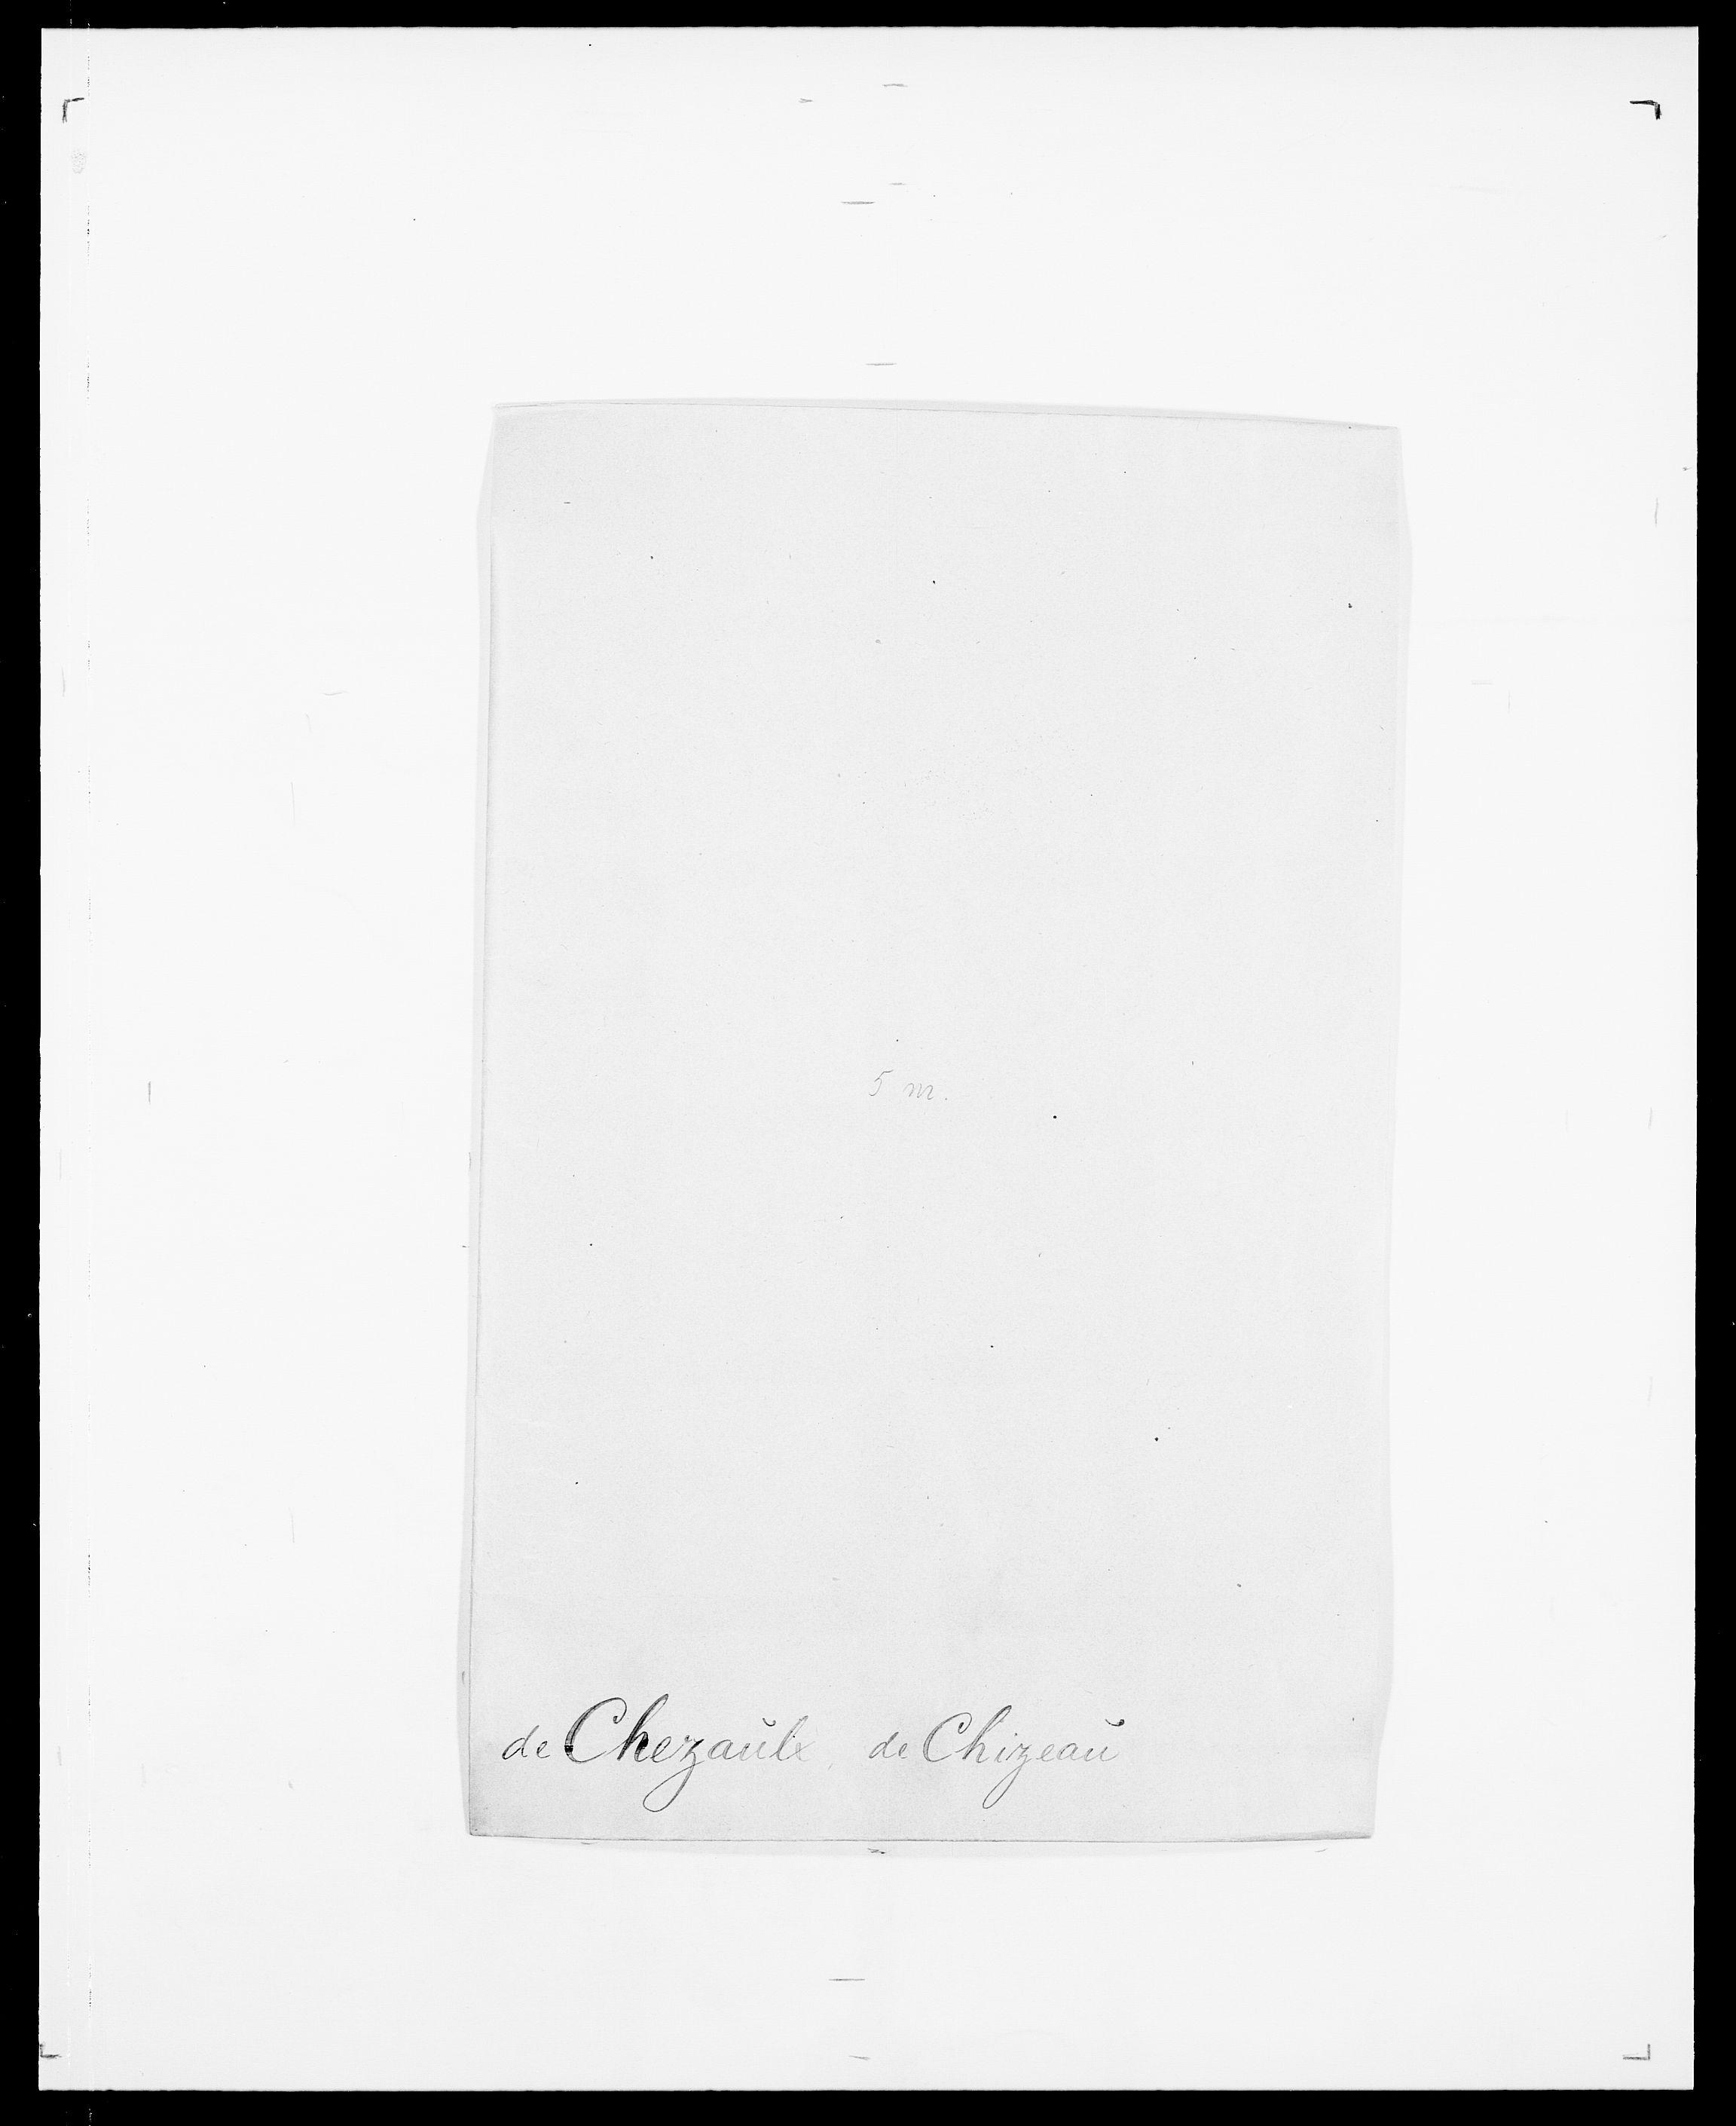 SAO, Delgobe, Charles Antoine - samling, D/Da/L0008: Capjon - Dagenbolt, s. 175